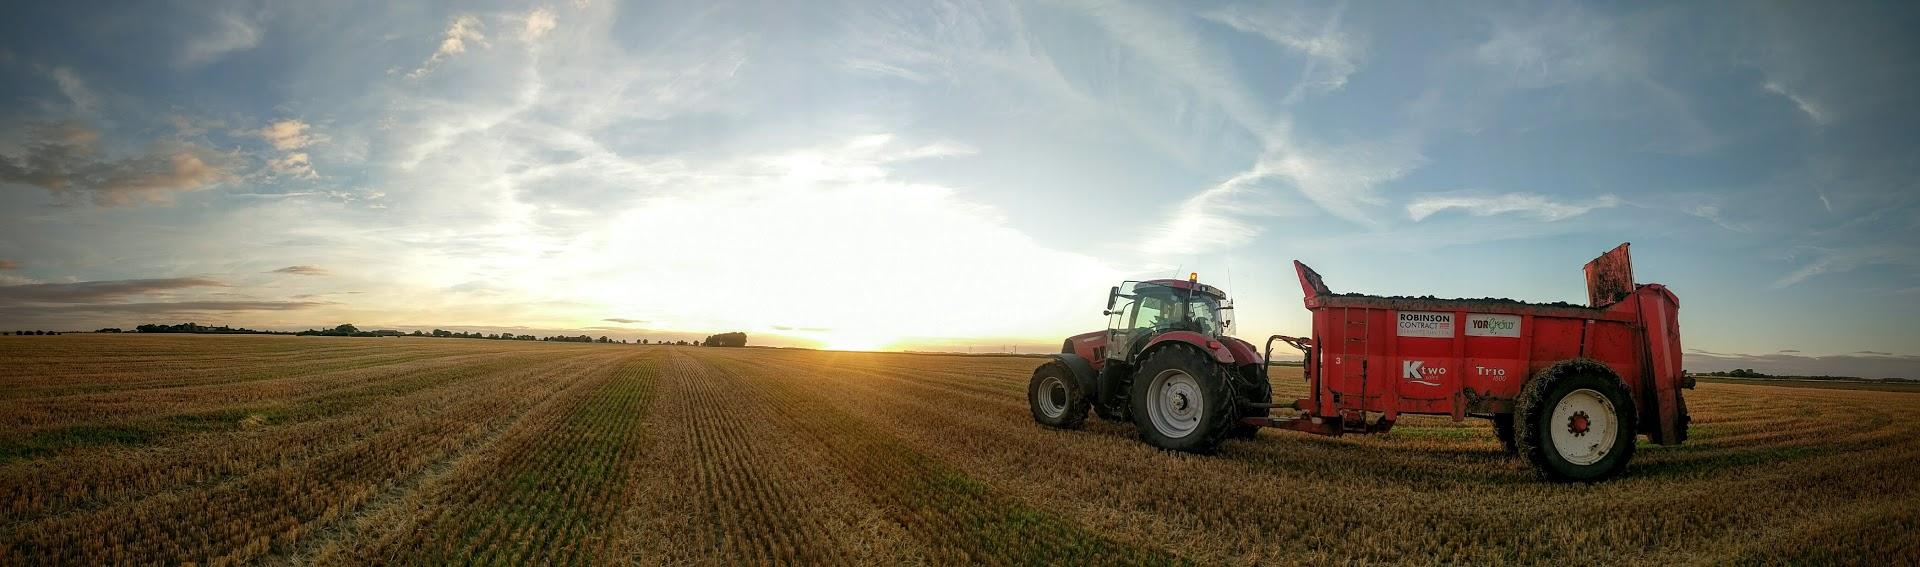 tractor-2.jpg